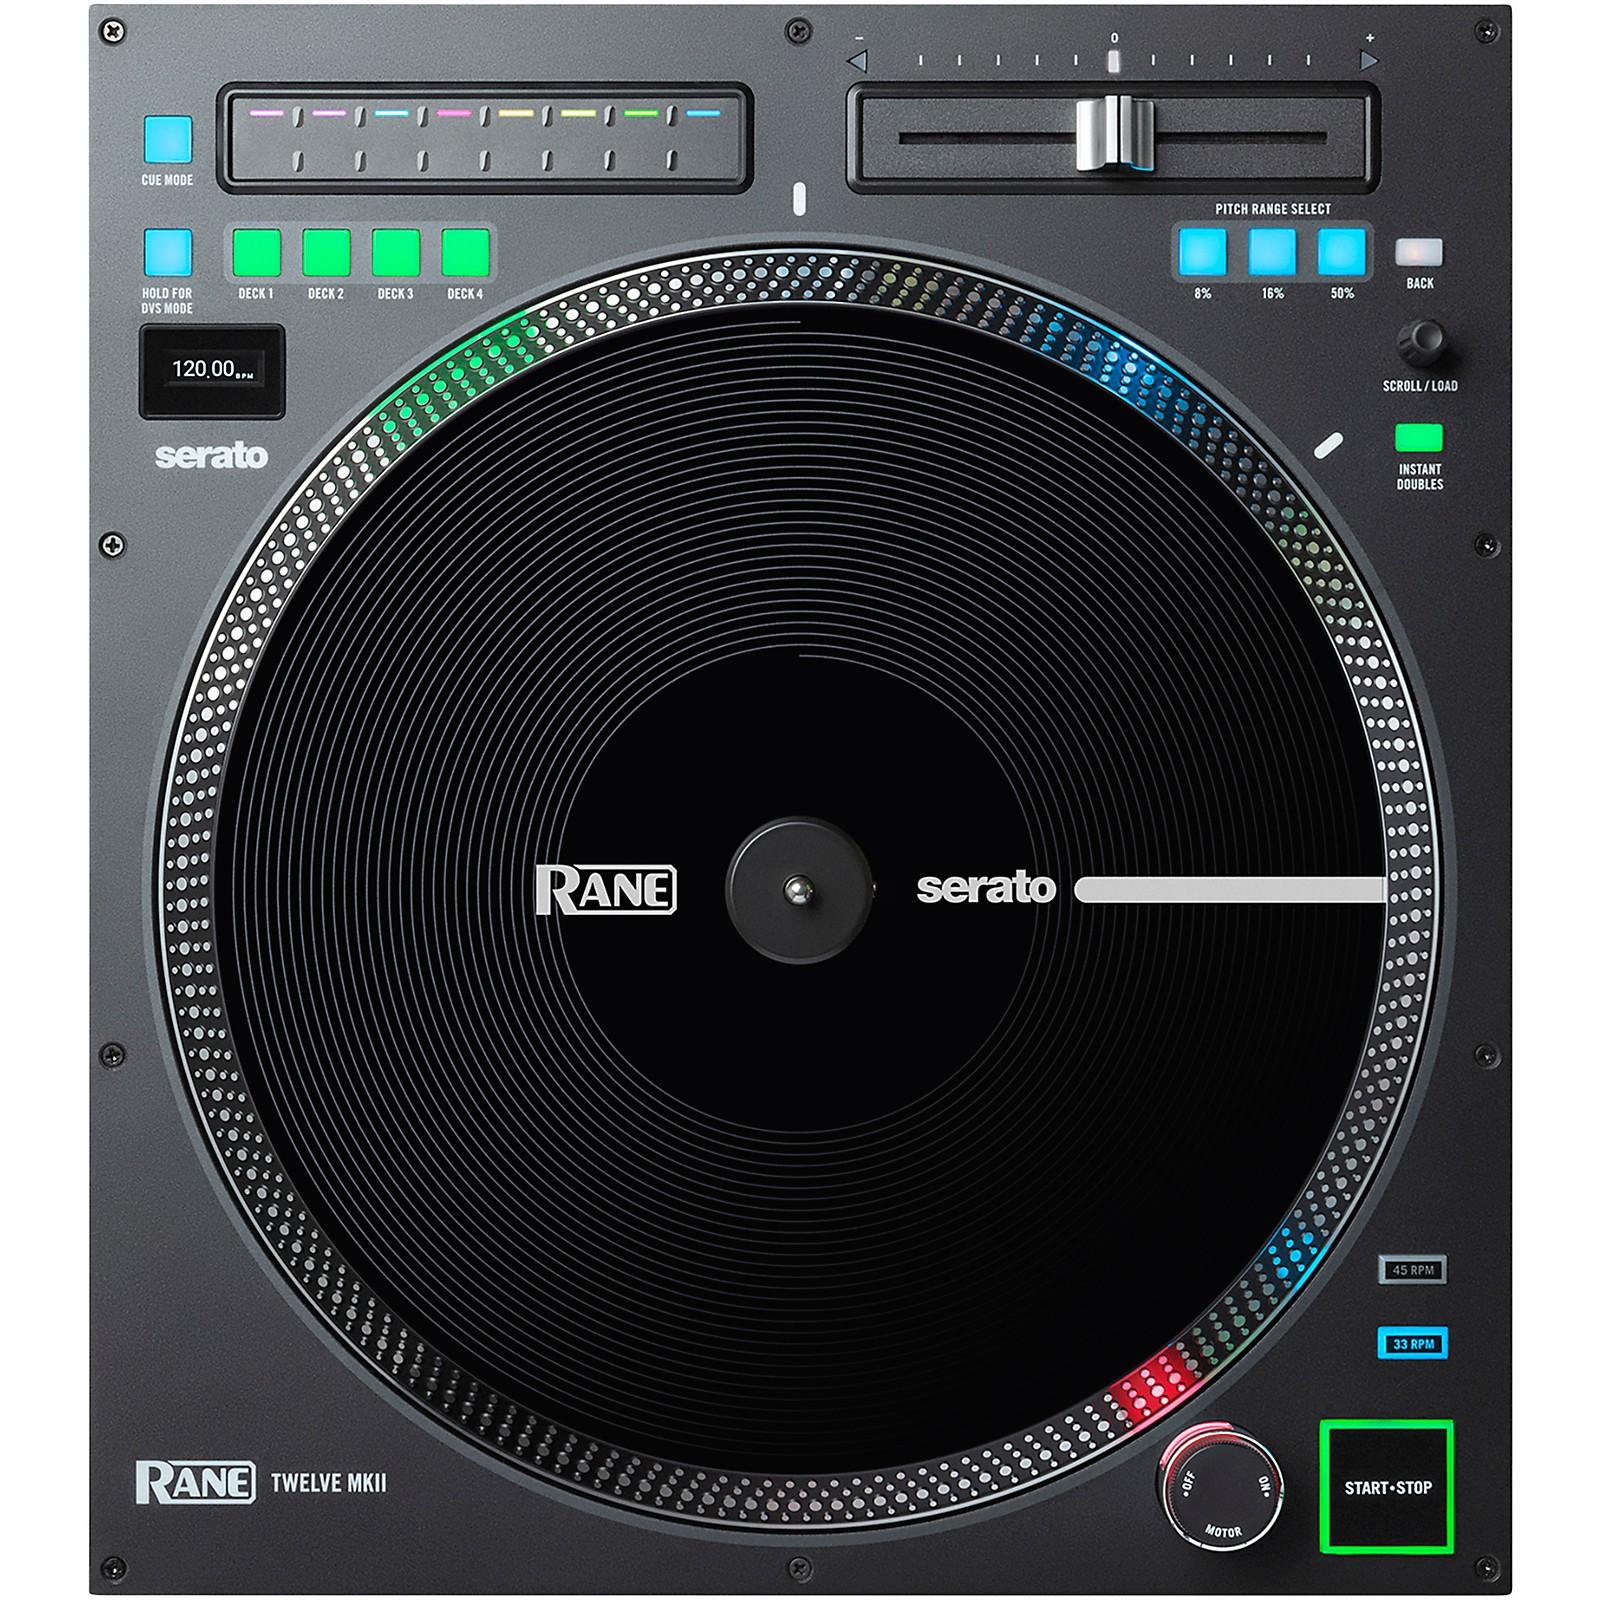 RANE TWELVE MKII Motorized Battle-Ready DJ MIDI Controller